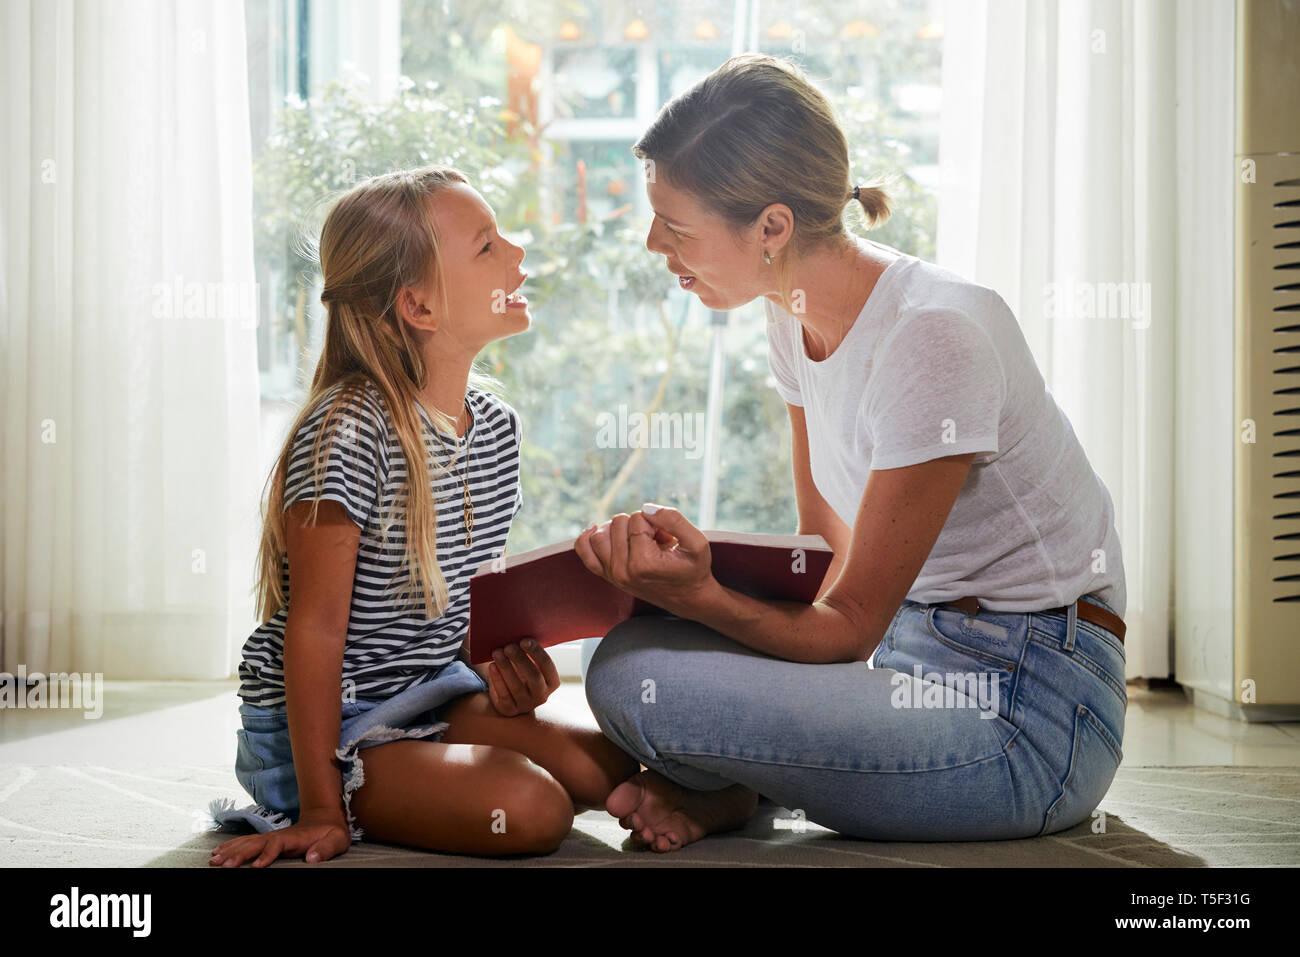 Mutter und Tochter Buch diskutieren Stockbild